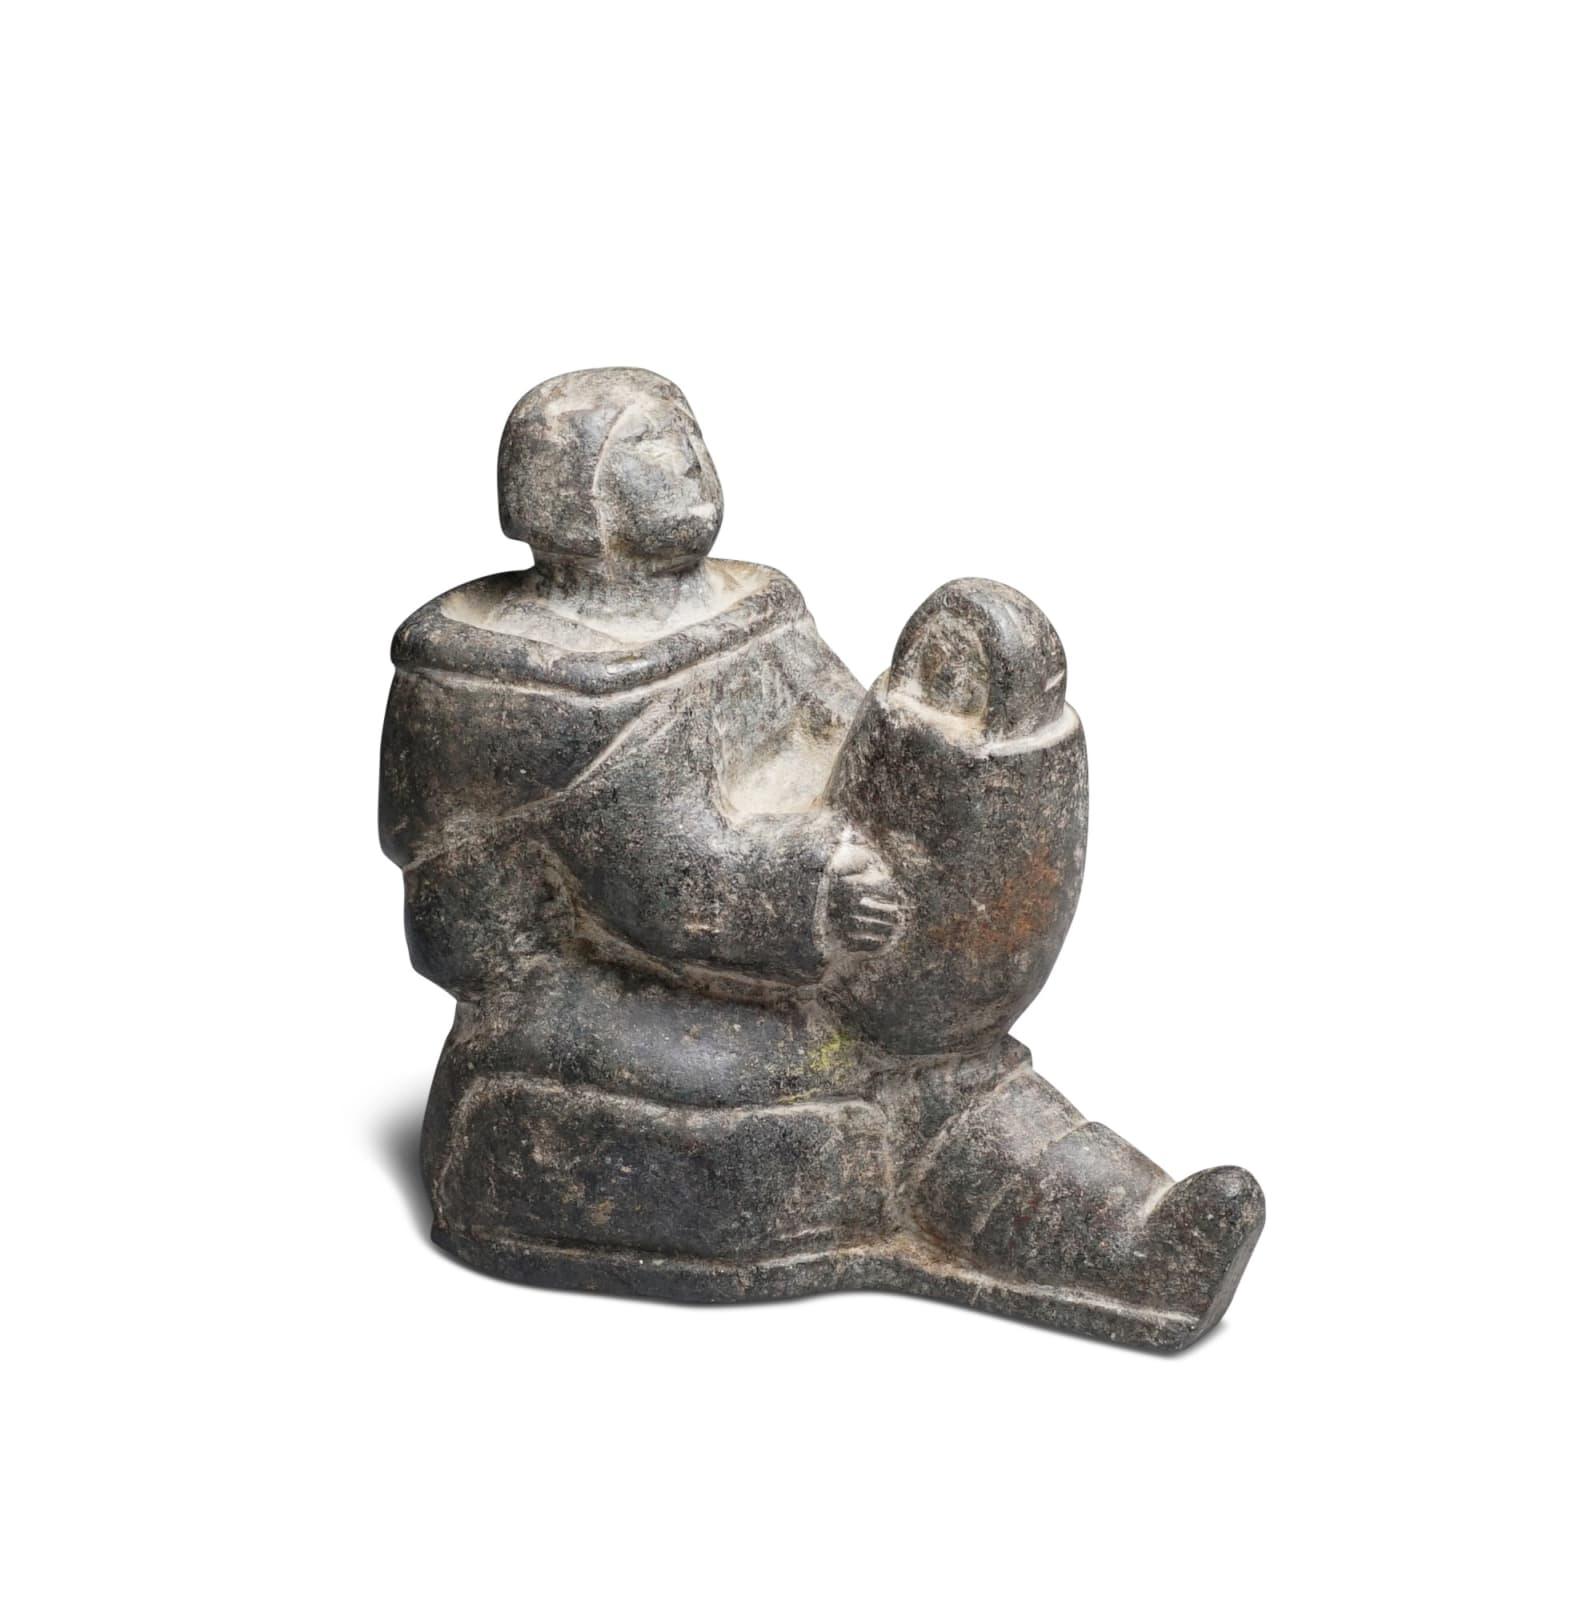 Possibly: MIAIJI UITANGI USAITAIJUK (1911-D), SALLUIT (SUGLUK) Mother Holding Her Swaddled Child, late 1950s stone, 5 x 2 1/2 x 4 1/2 in (12.7 x 6.3 x 11.4 cm) ESTIMATE: $500 — $700 New Price: $300